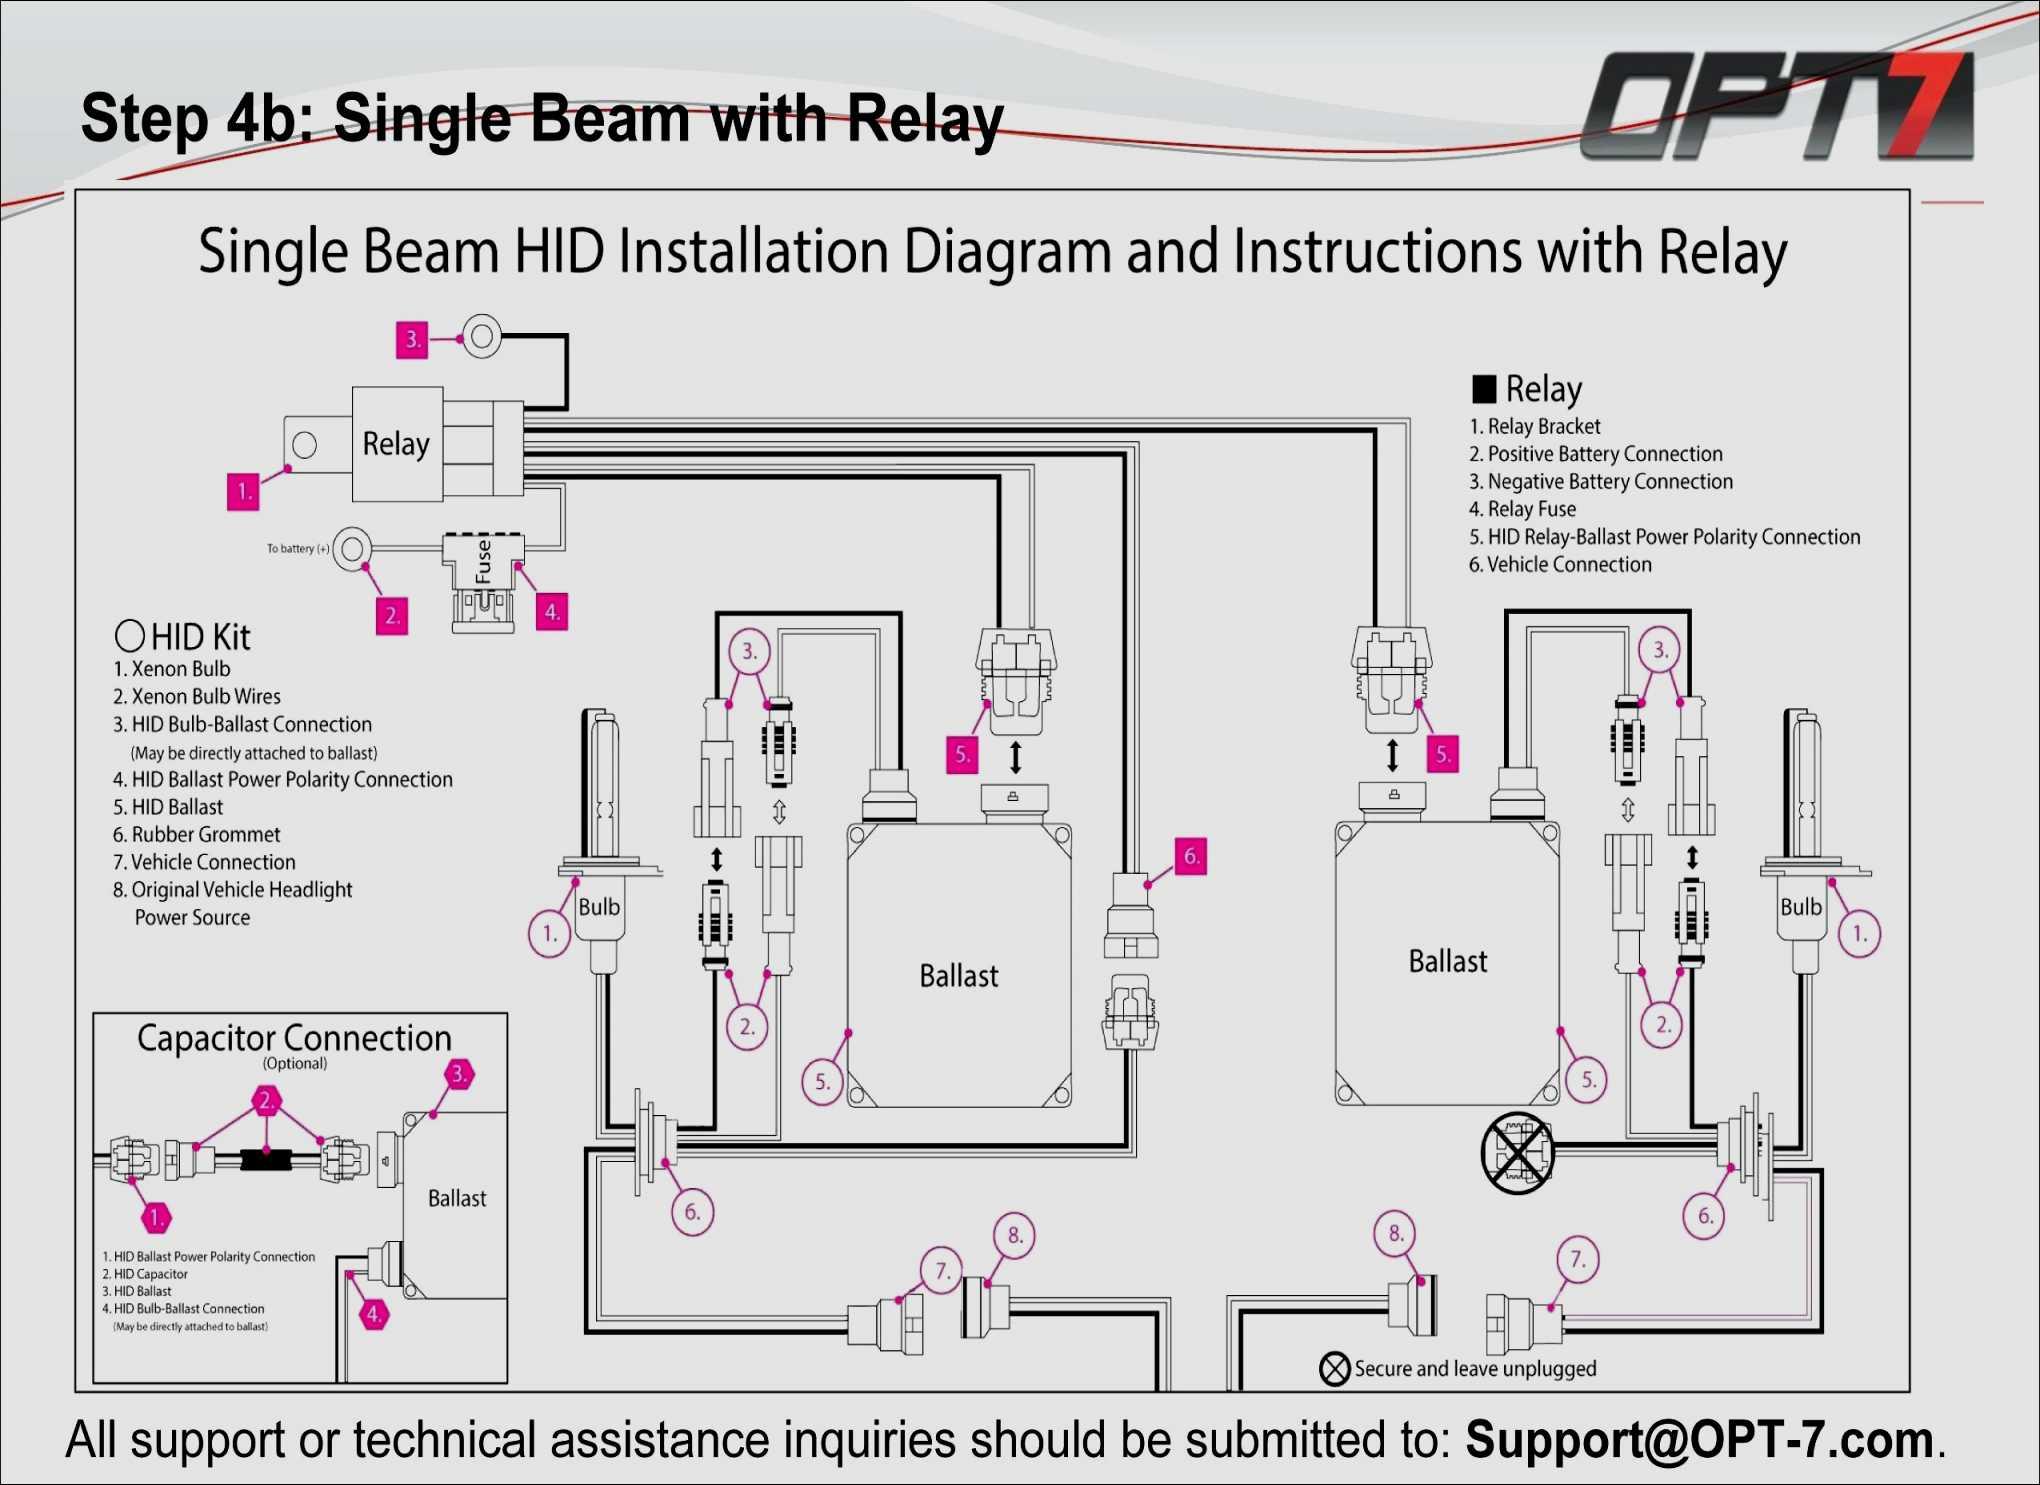 T8 Electronic Ballast Wiring Diagram Free Picture   Wiring Diagram - 2 Lamp T8 Ballast Wiring Diagram